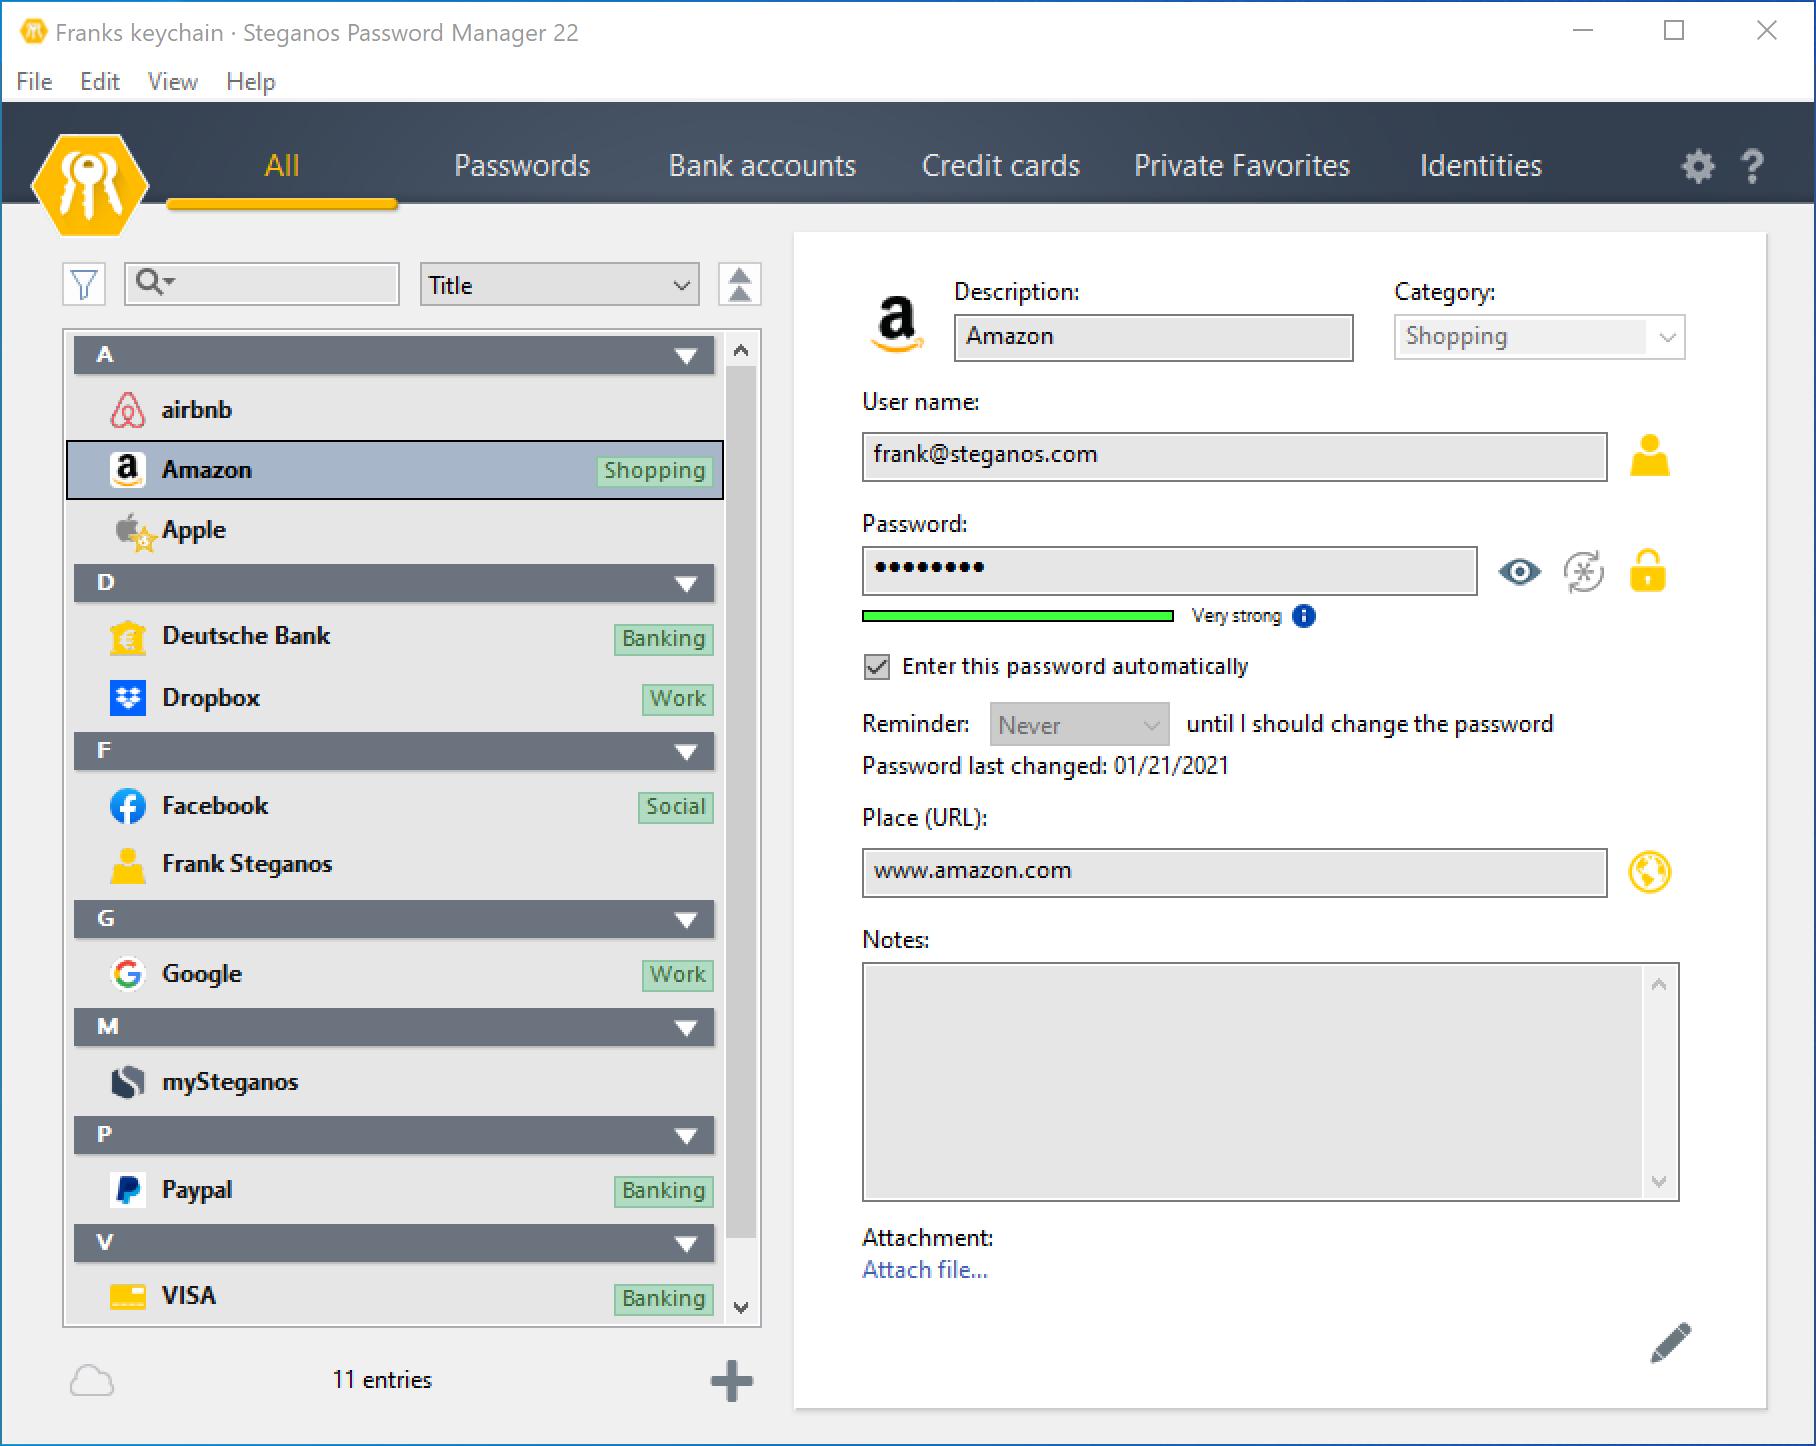 Steganos Password Manager 22 Screenshot